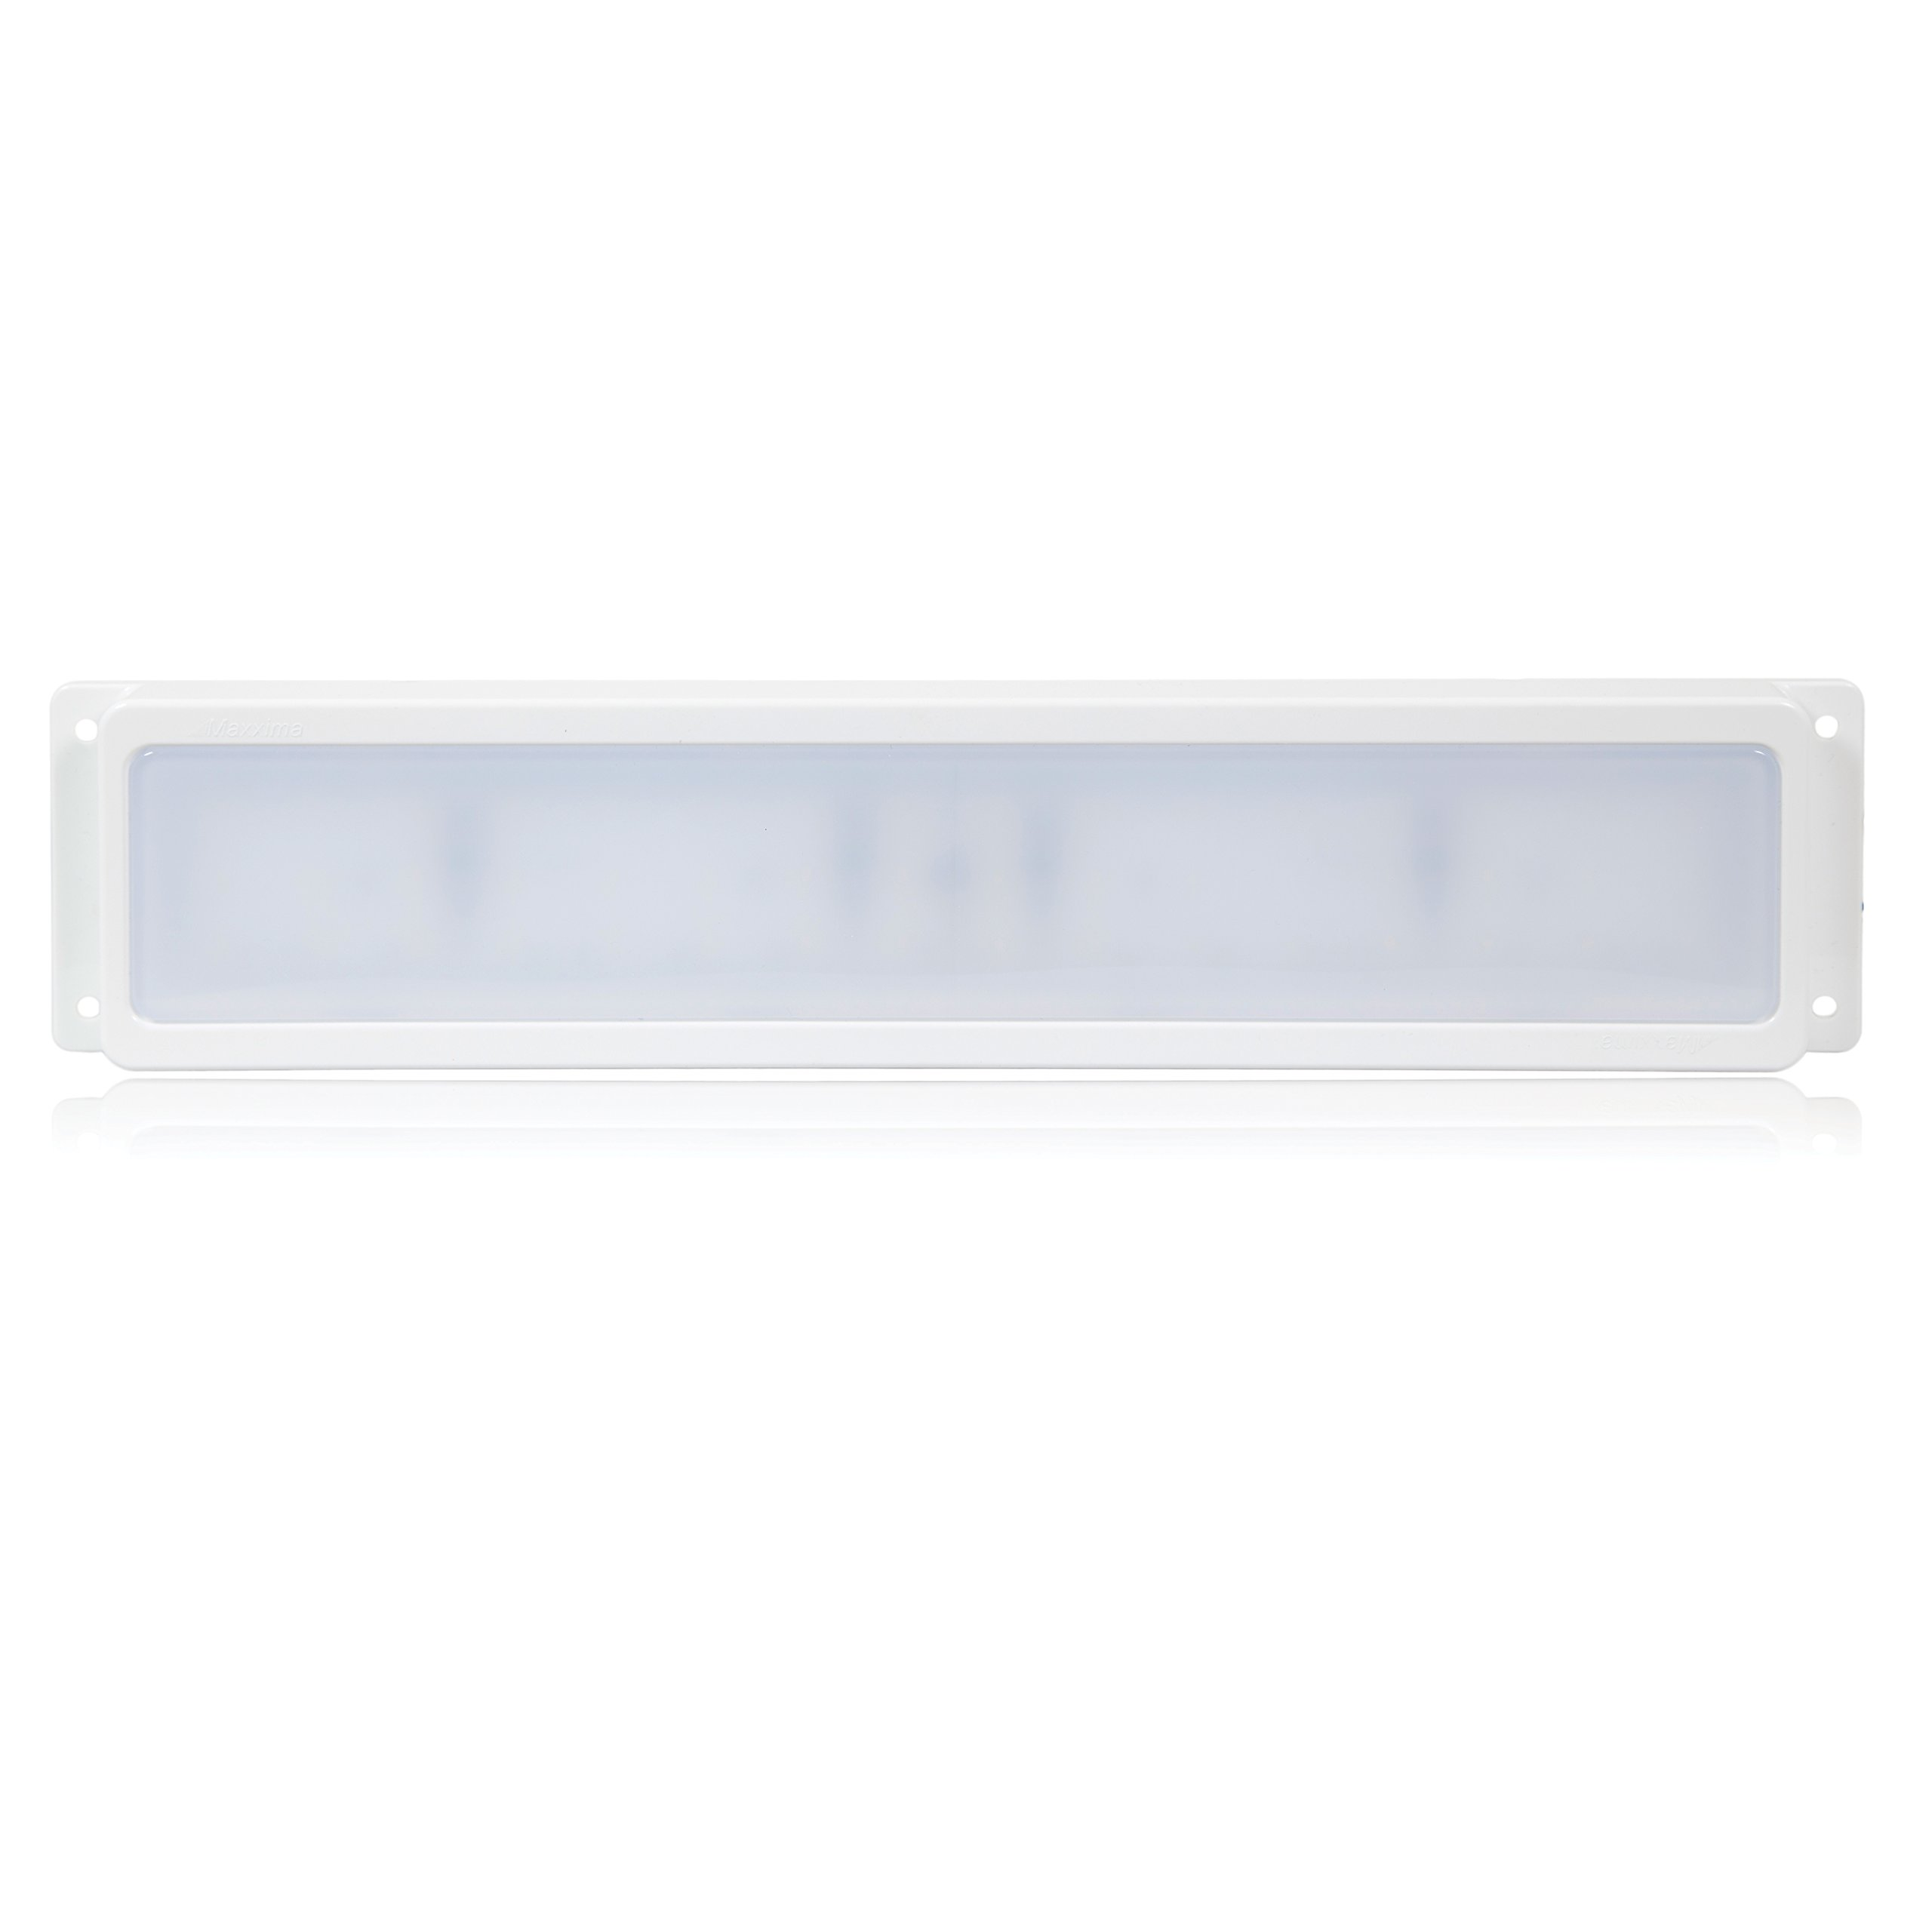 Maxxima M84440 White 800 Lumens Rectangular Surface Mount Interior LED Cargo Light by Maxxima